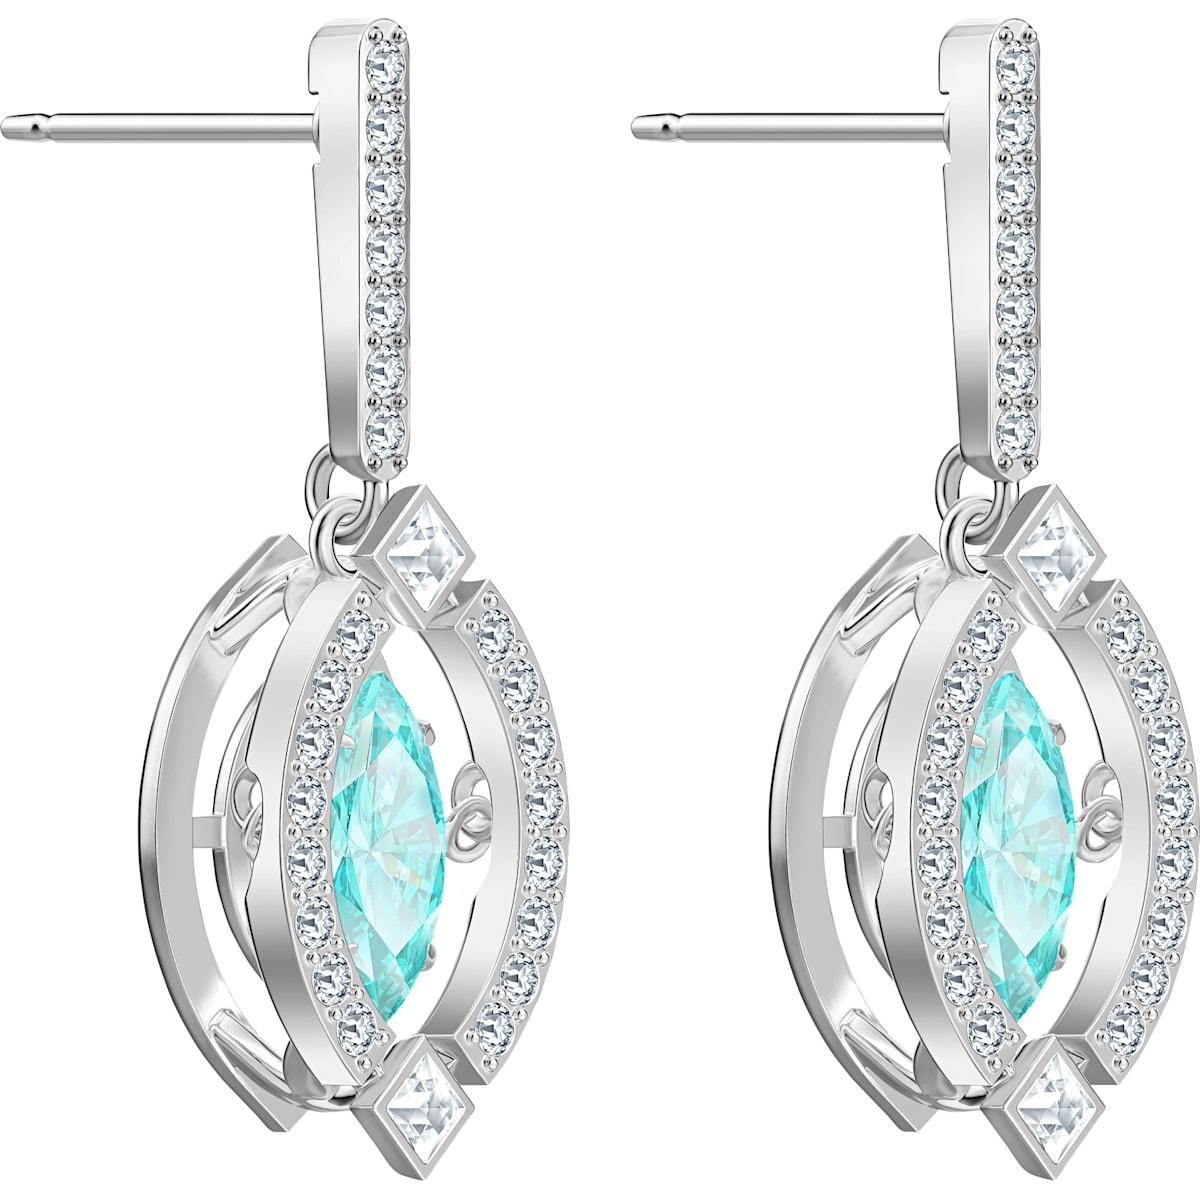 Swarovski Sparkling Dance Rainbow Pierced Earrings, Light